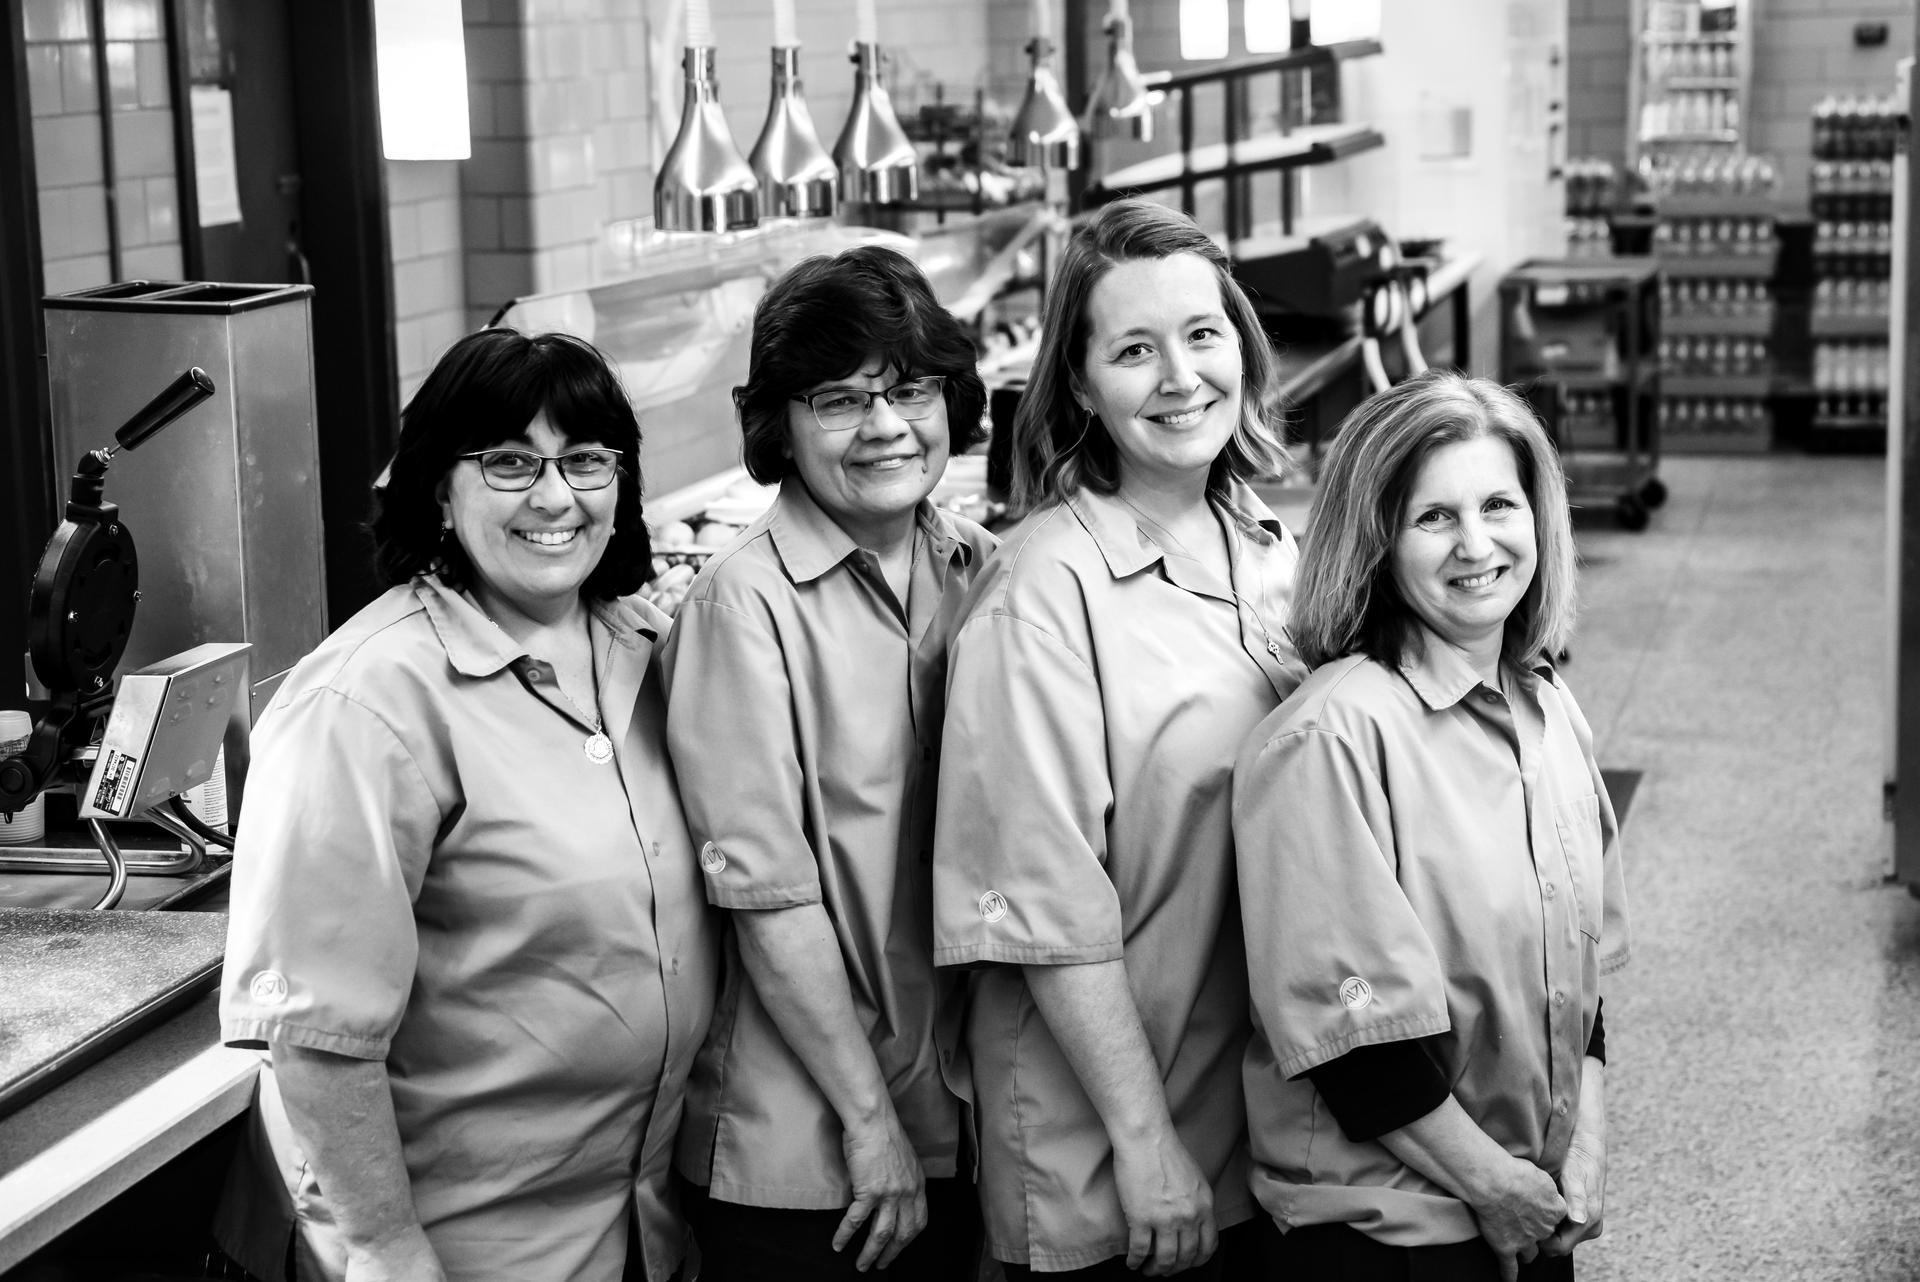 Seton LaSalle cafeteria staff